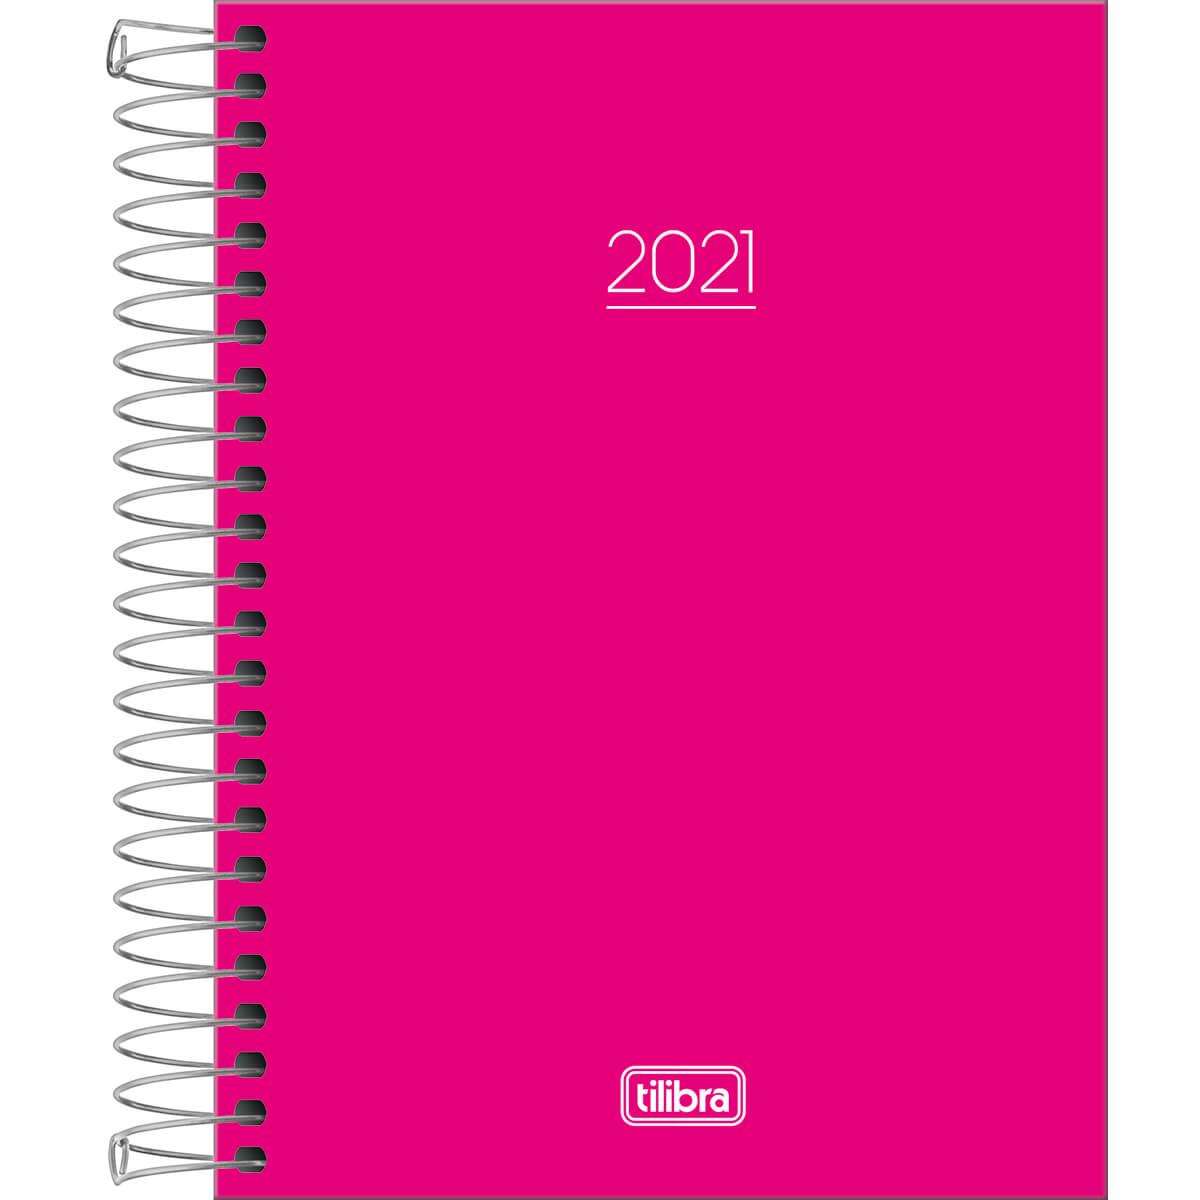 Agenda 2021 espiral 160 fls rosa Pepper M4 Tilibra